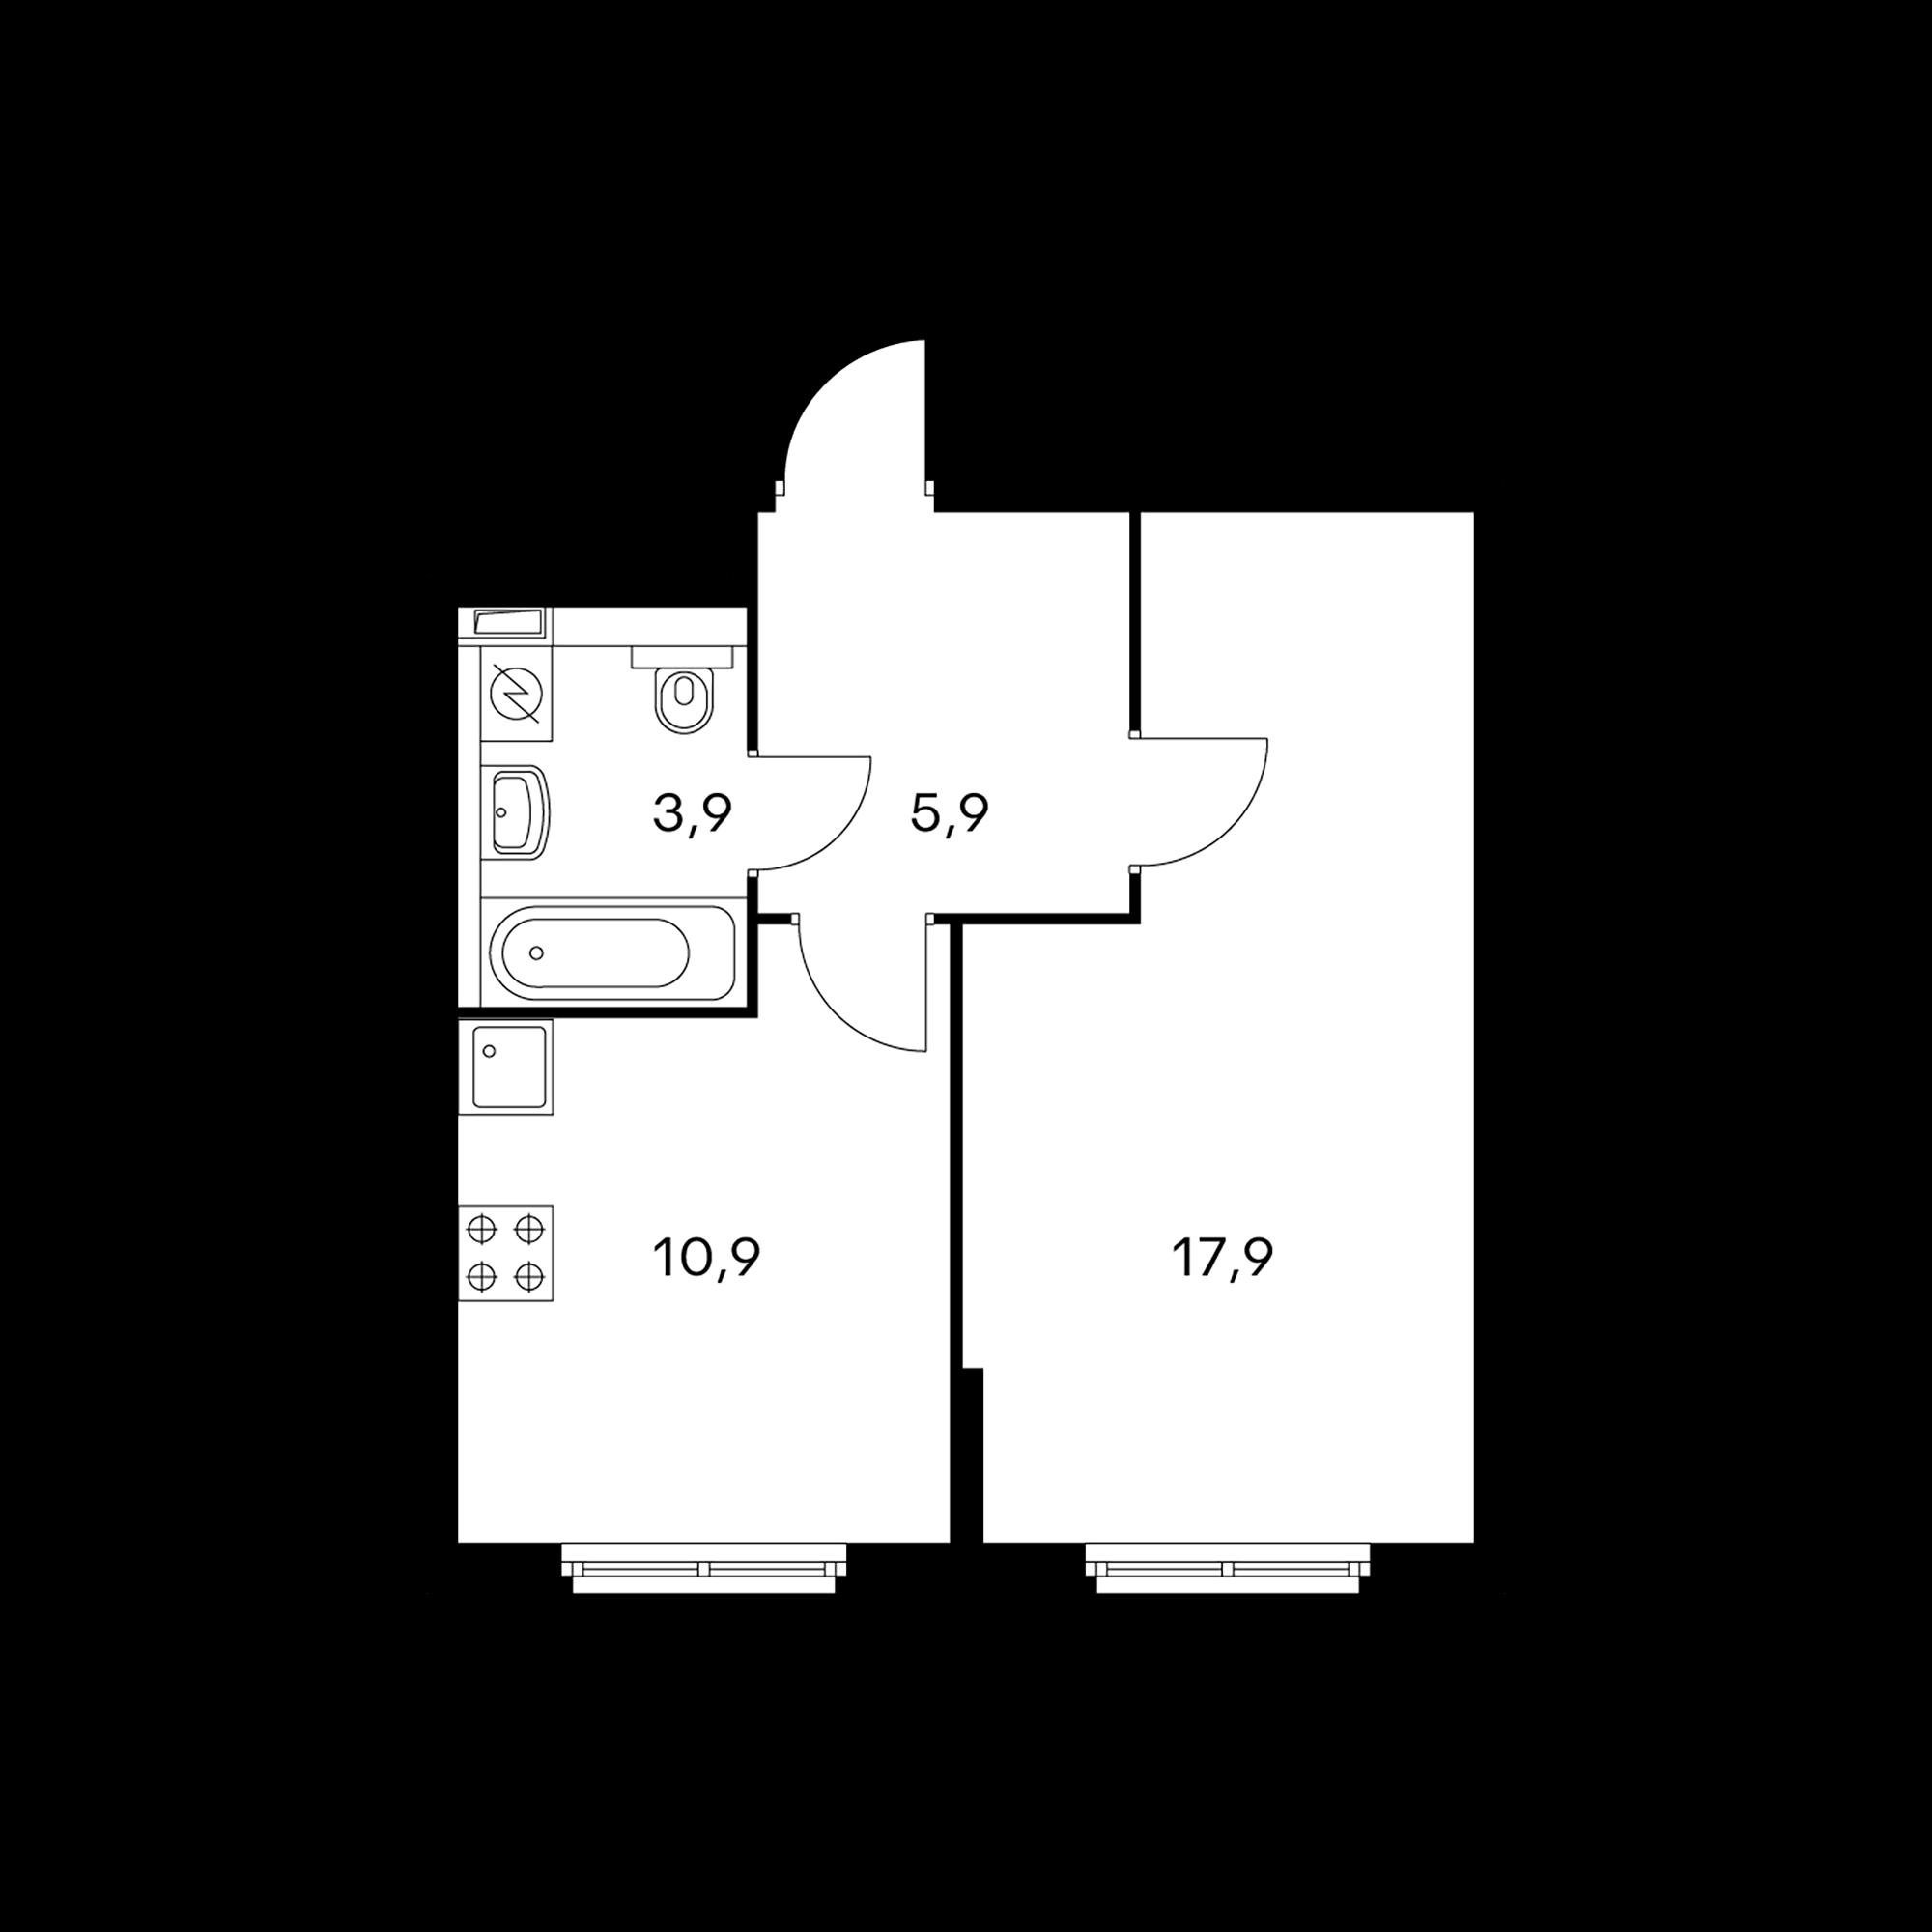 1KM1_6.6-1